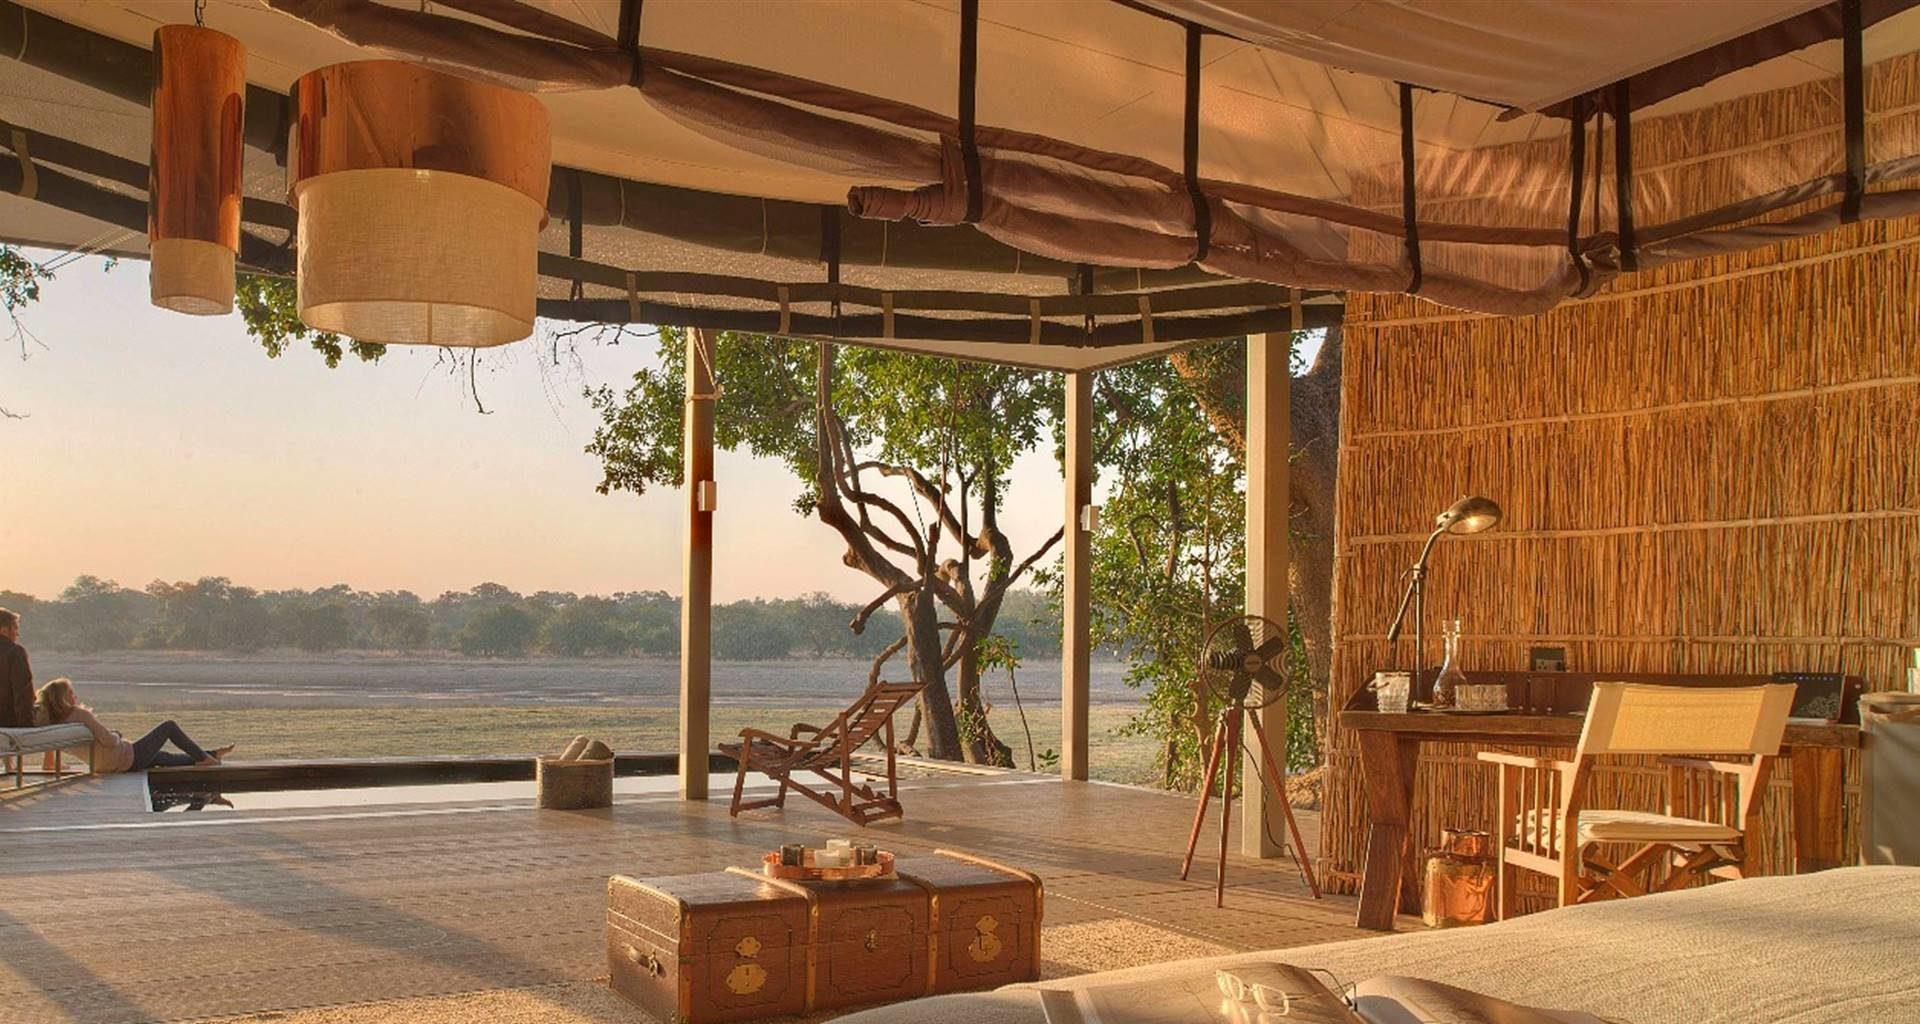 Chinzombo Zambia Bedroom